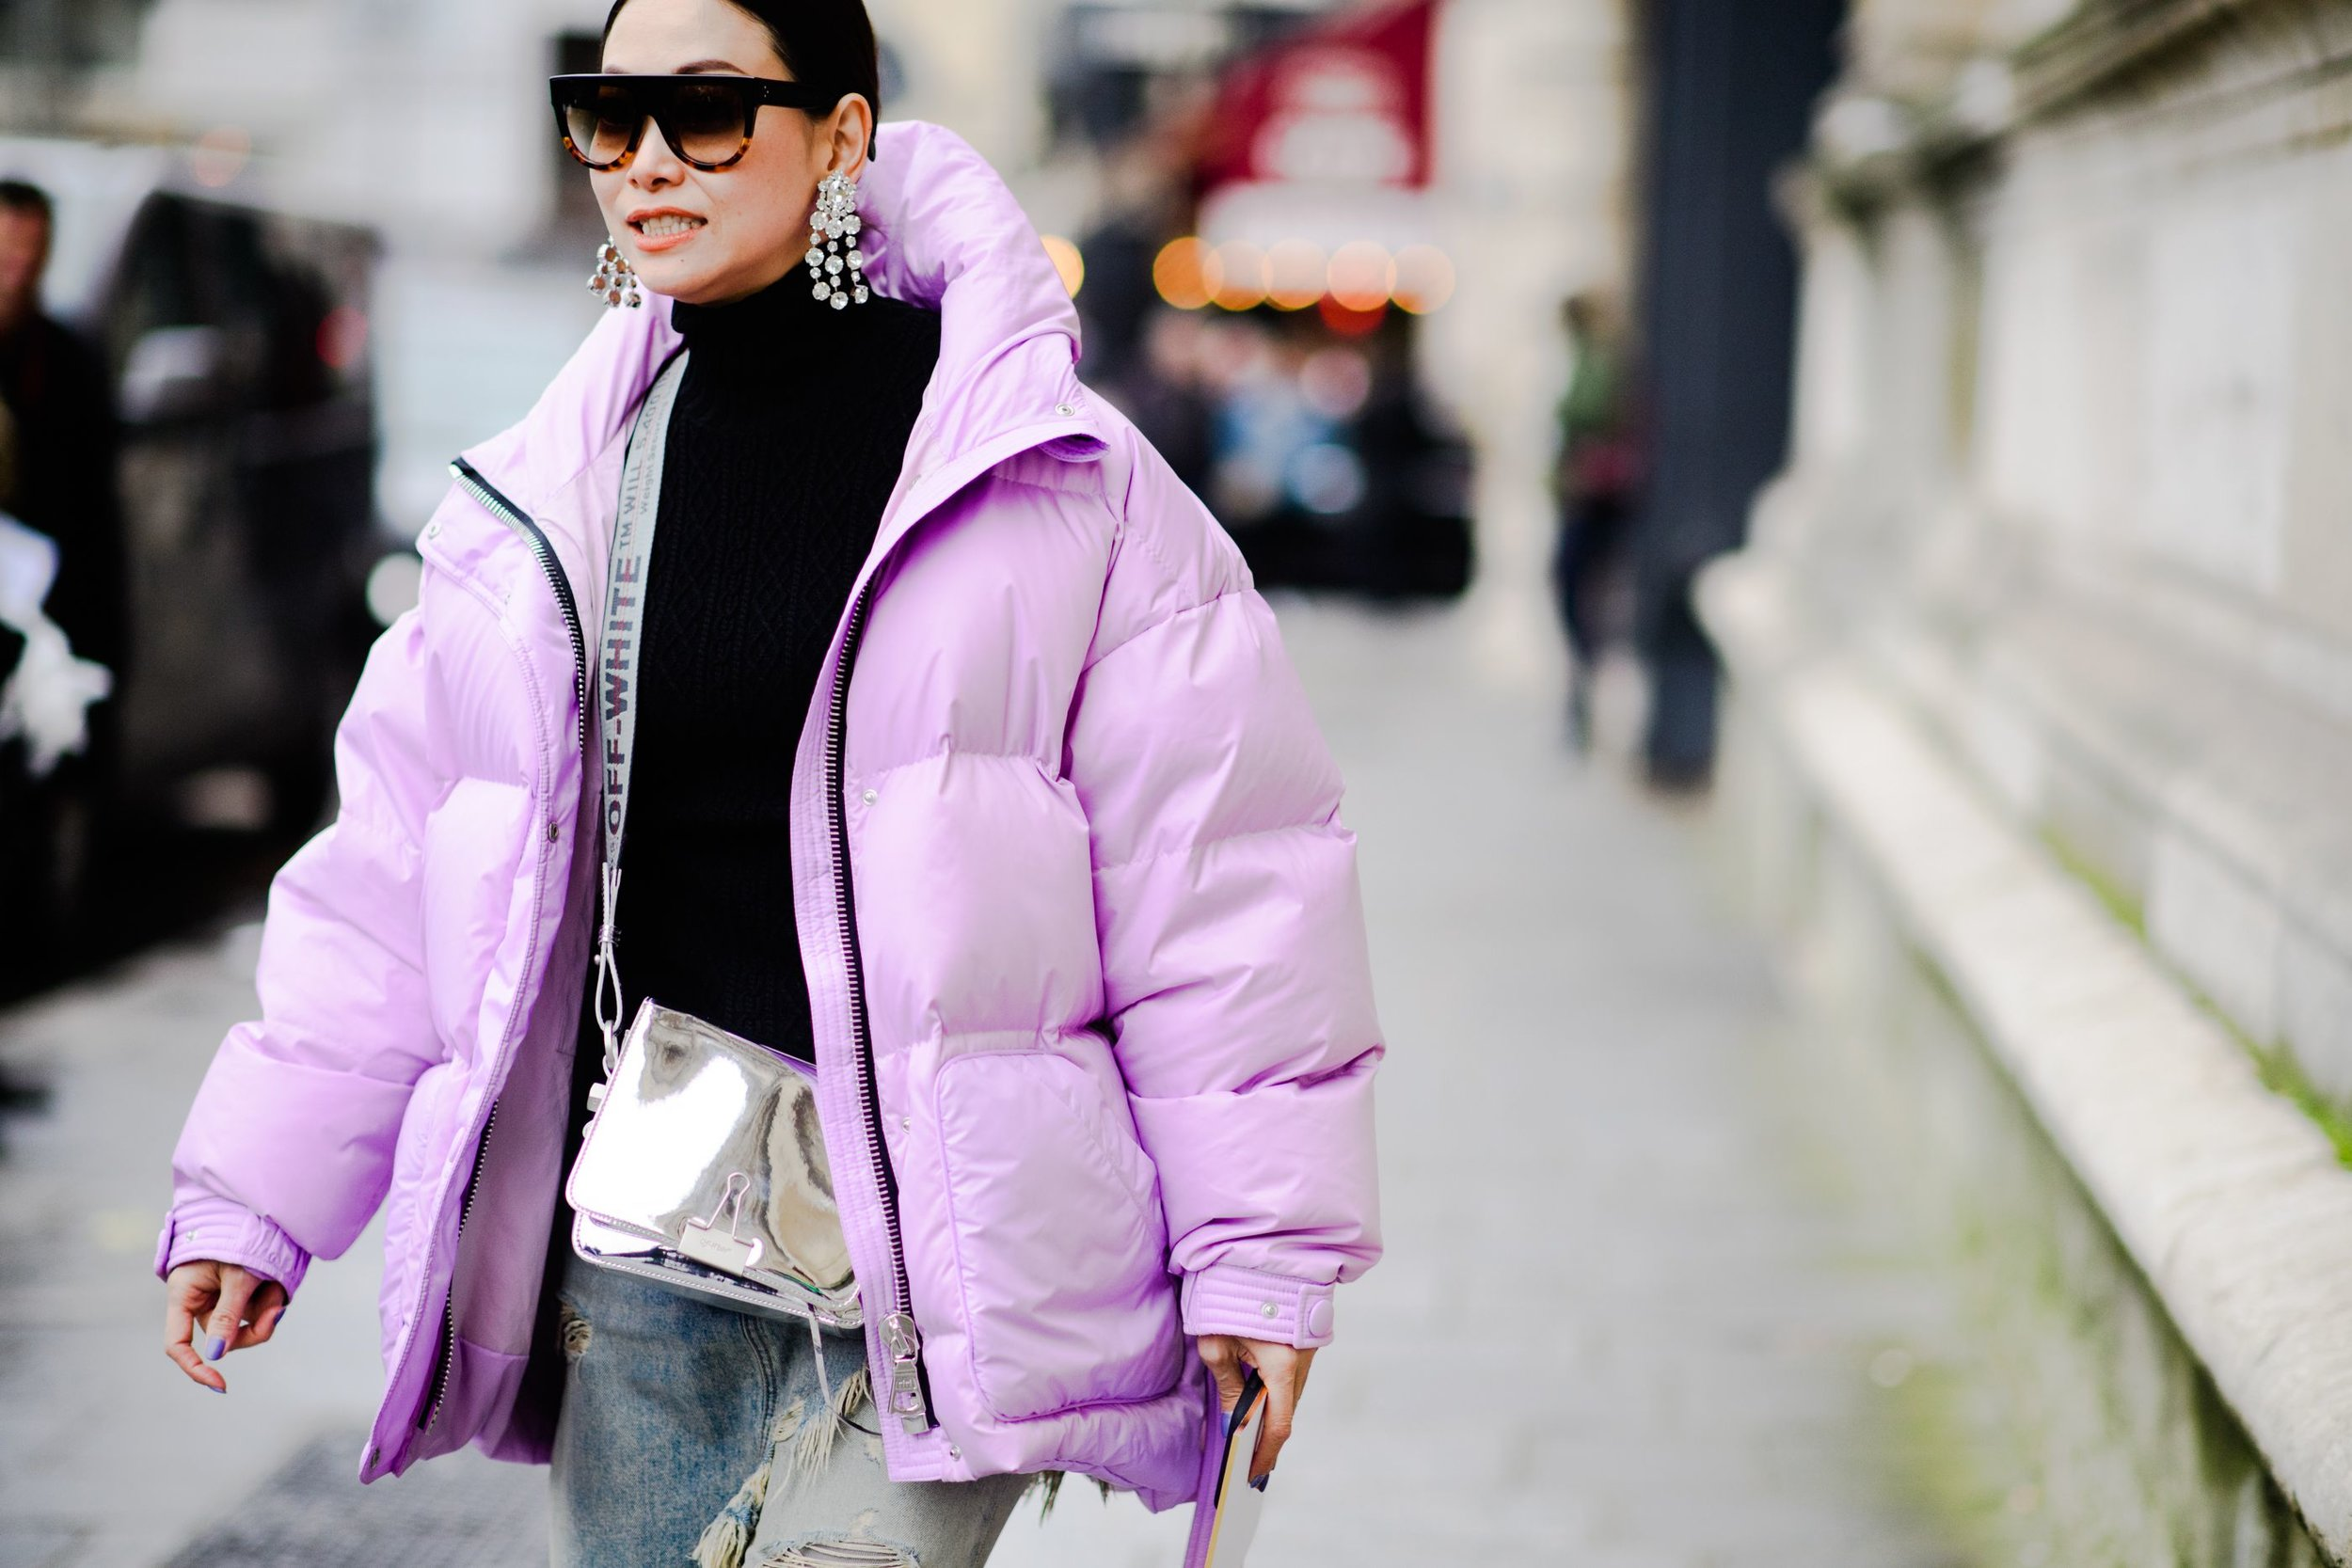 paris-haute-couture-fw18-street-style-by-tyler-joe-113-1516901524.jpg